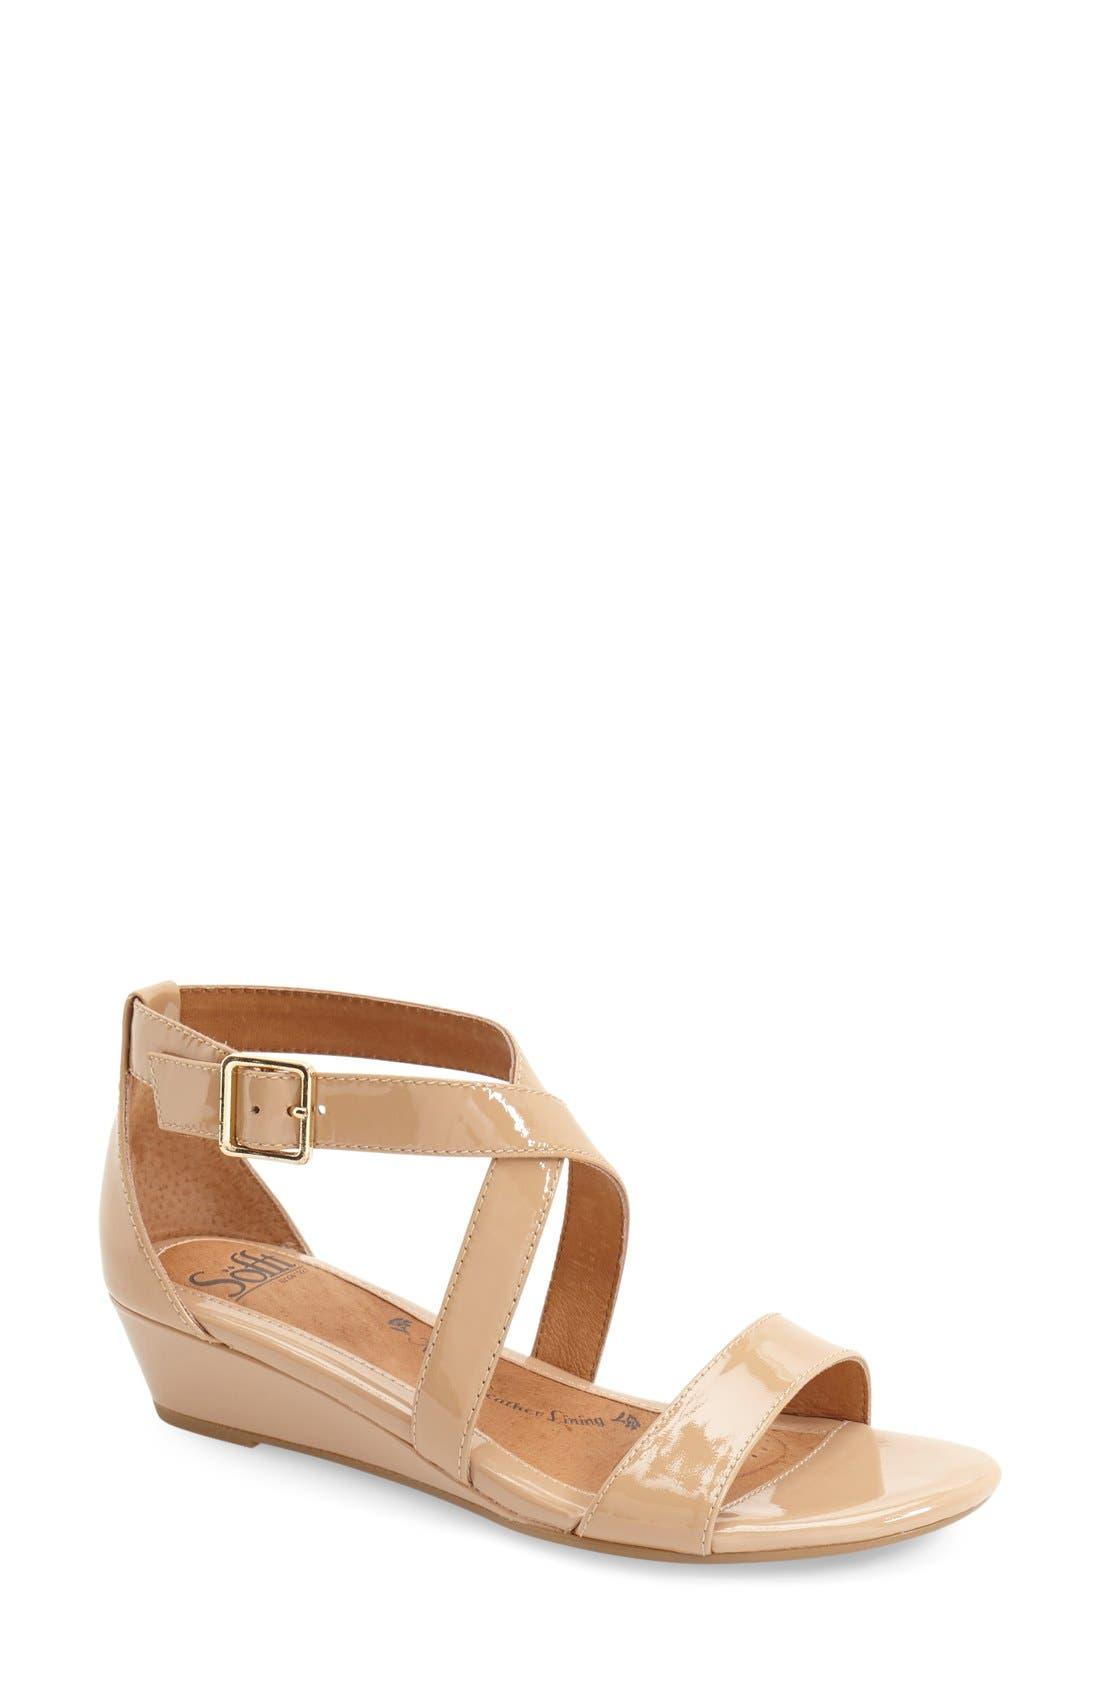 'Innis' Low Wedge Sandal,                             Main thumbnail 8, color,